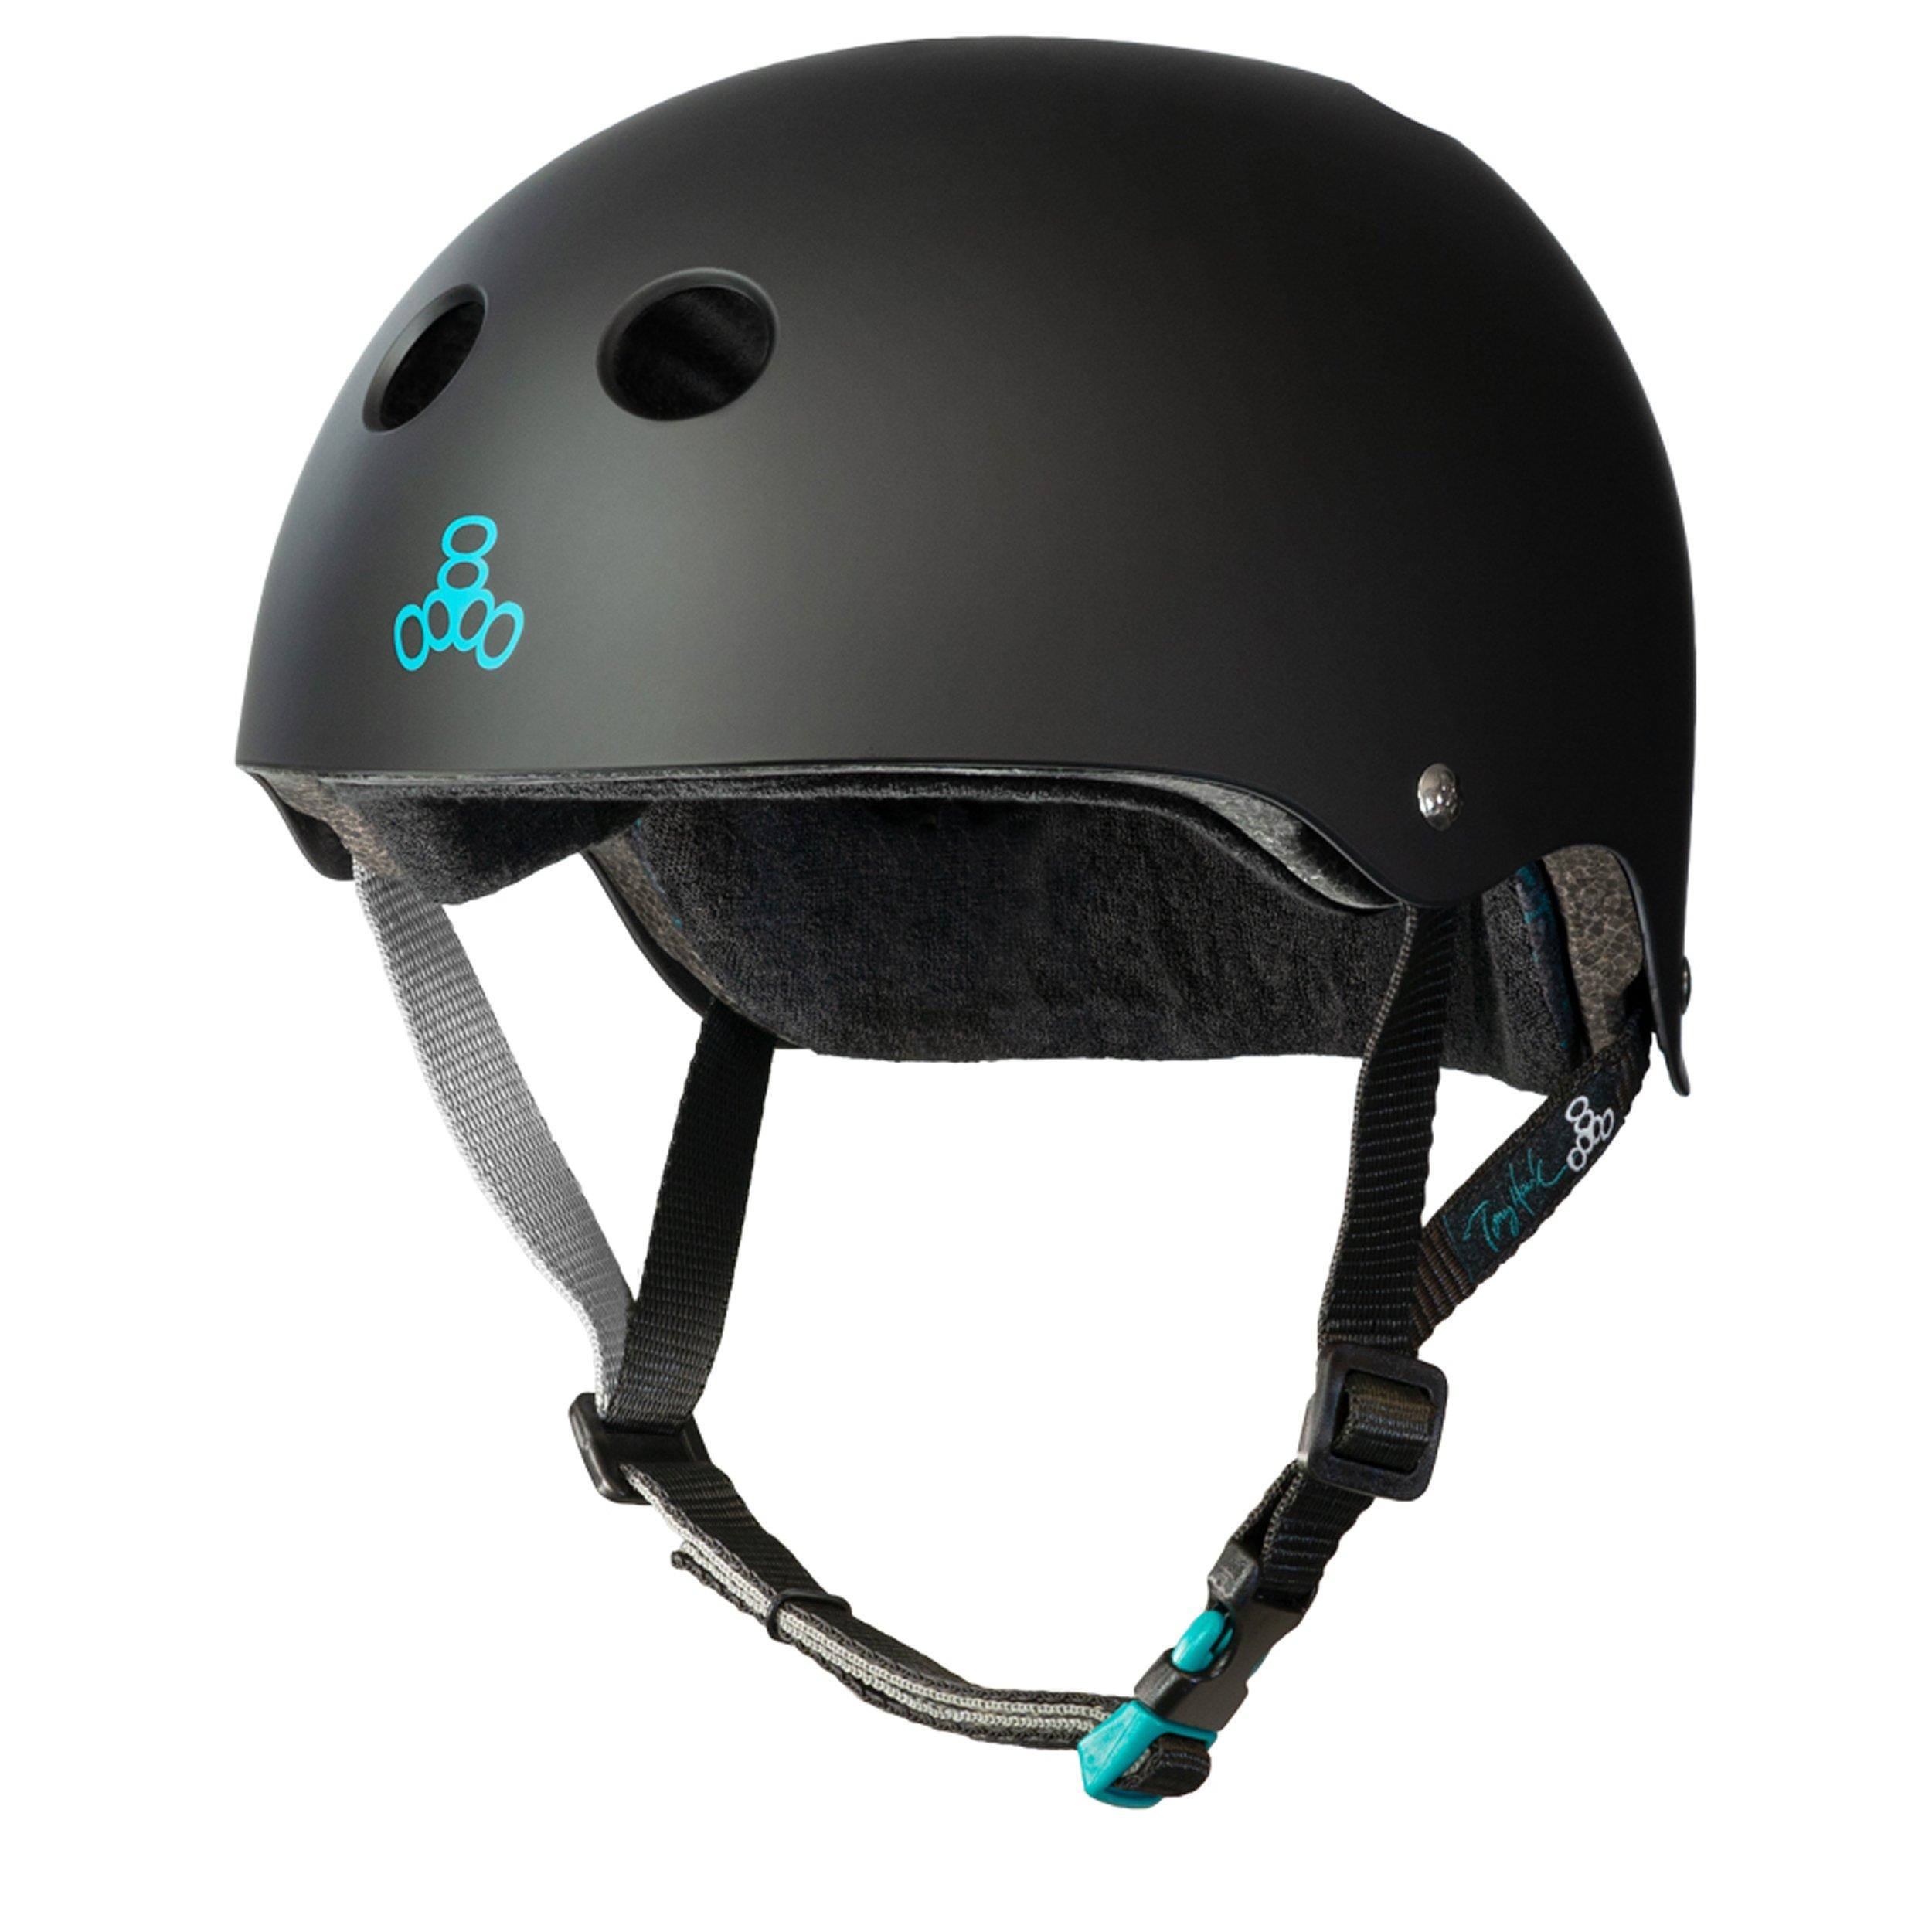 Triple Eight Tony Hawk Signature Model The Certified Sweatsaver Helmet for Skateboarding, BMX, and Roller Skating, Small/Medium